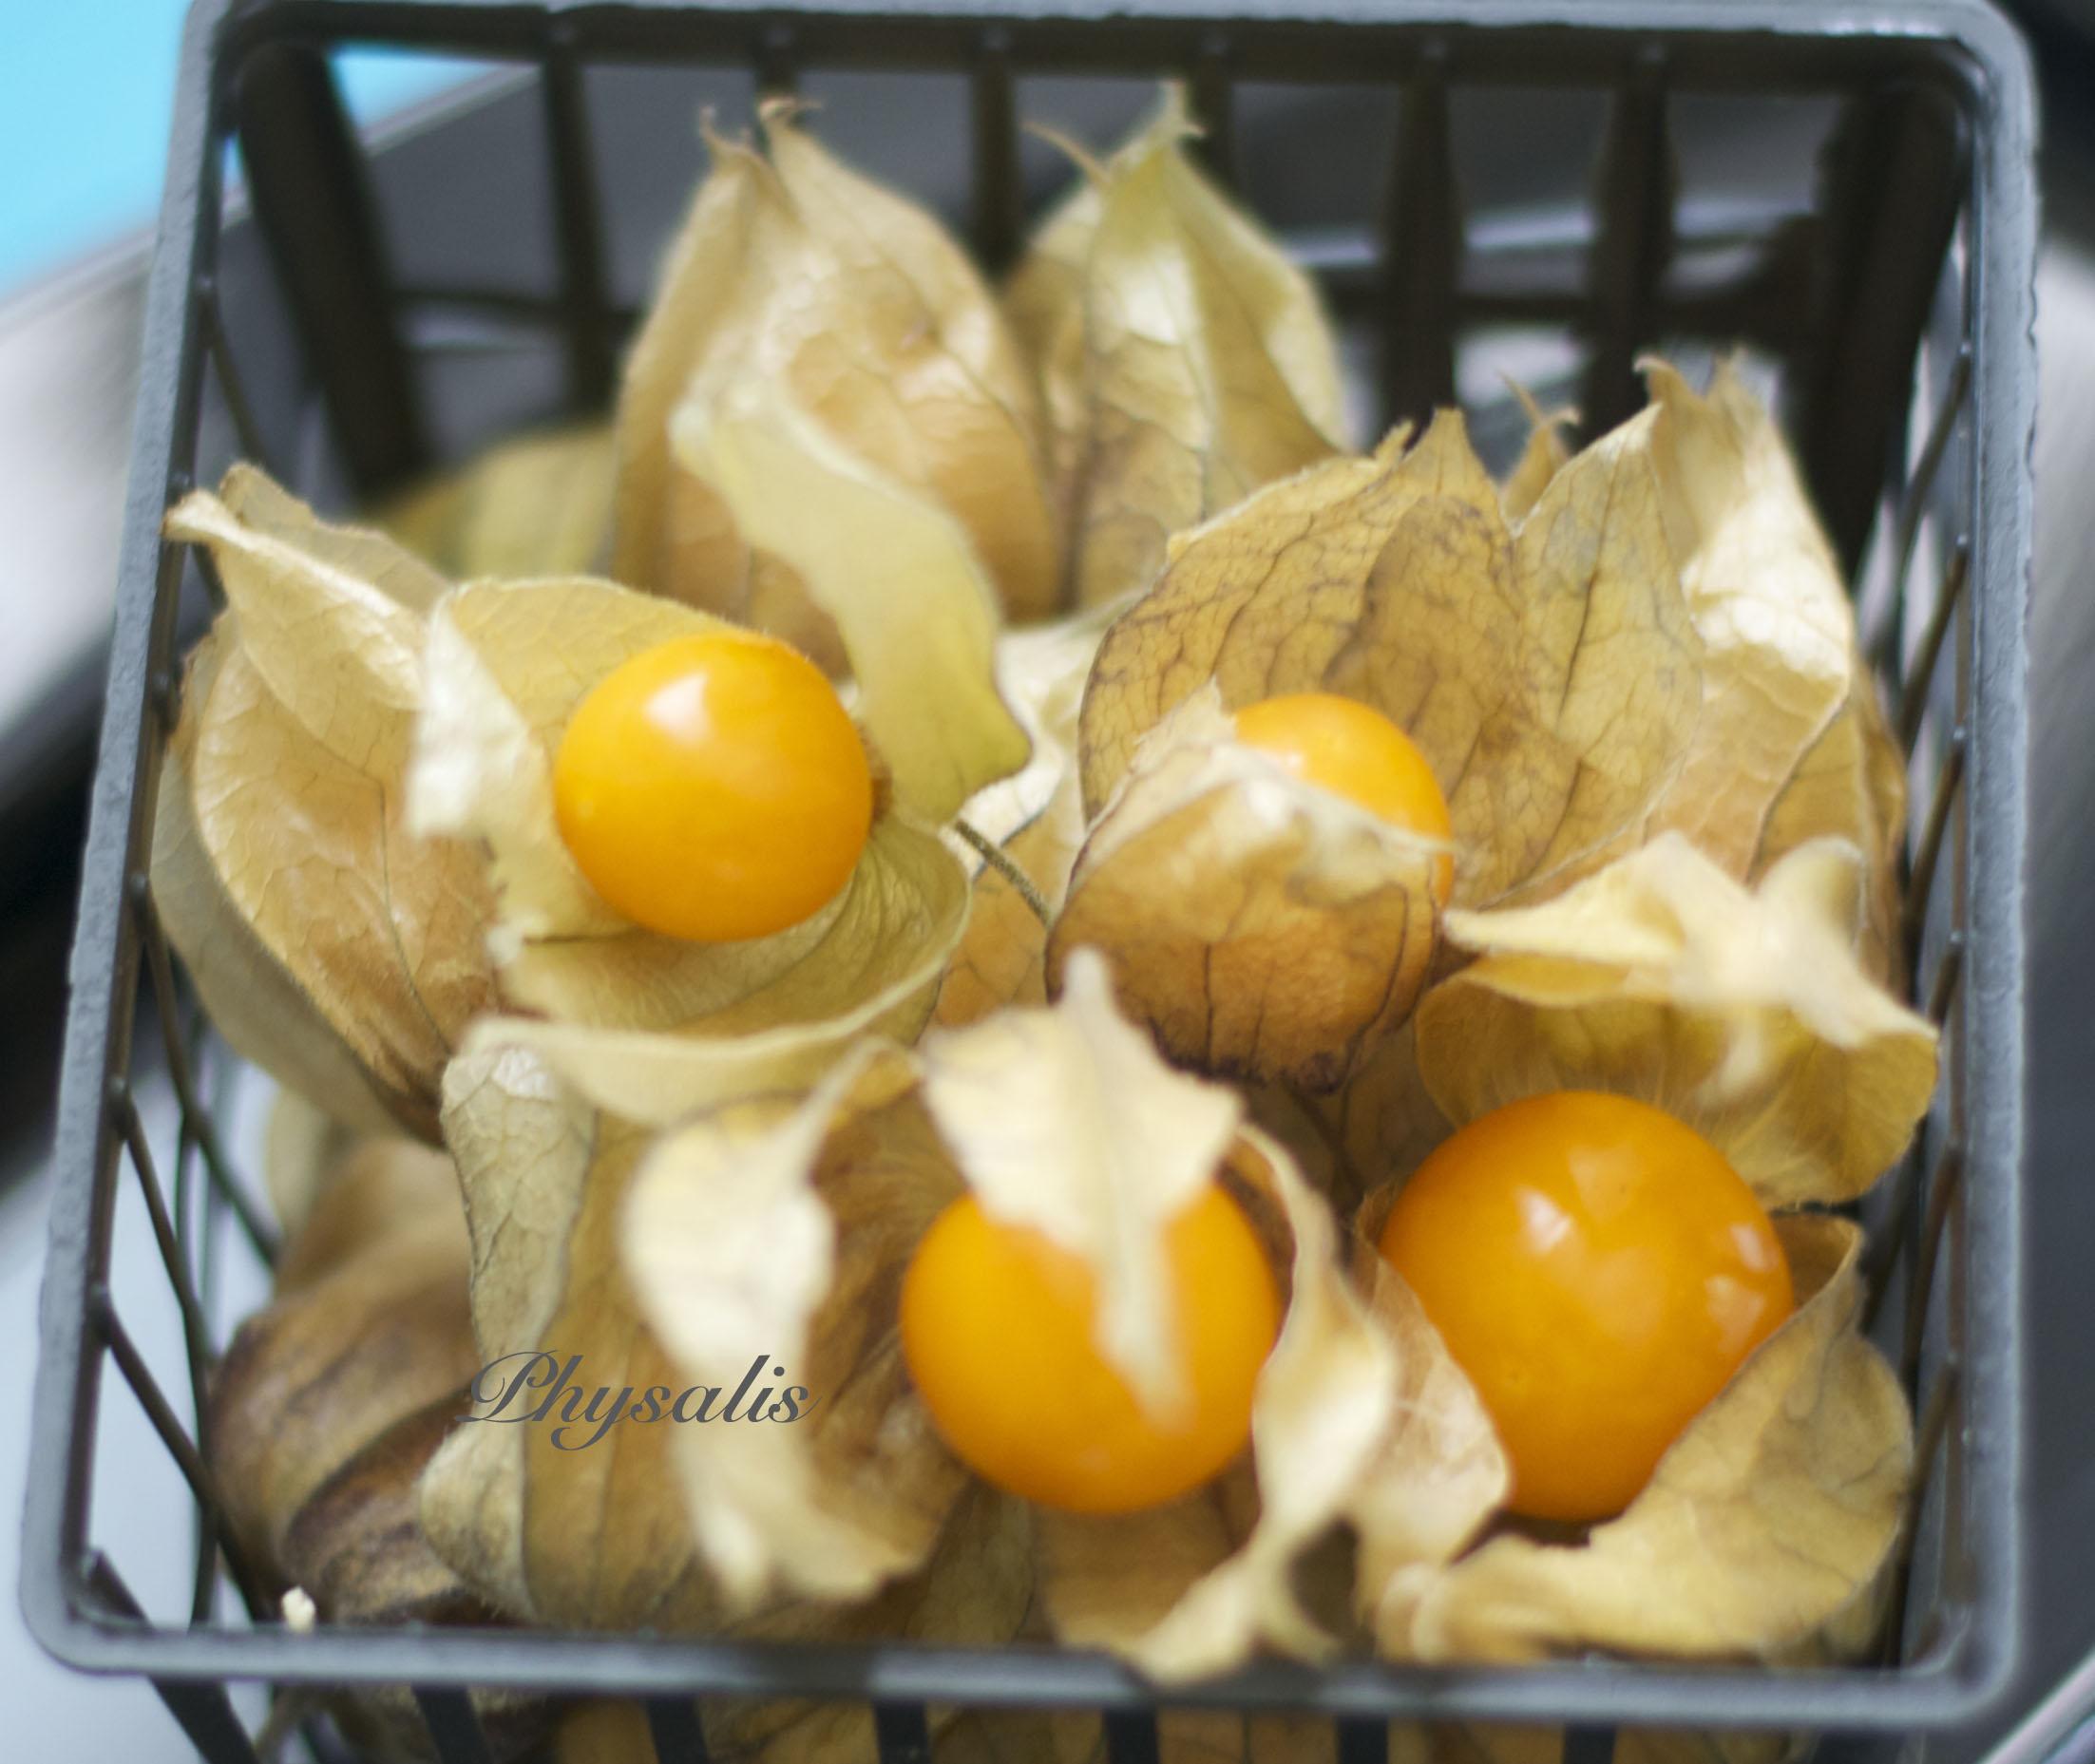 how to choose sweet pineapple